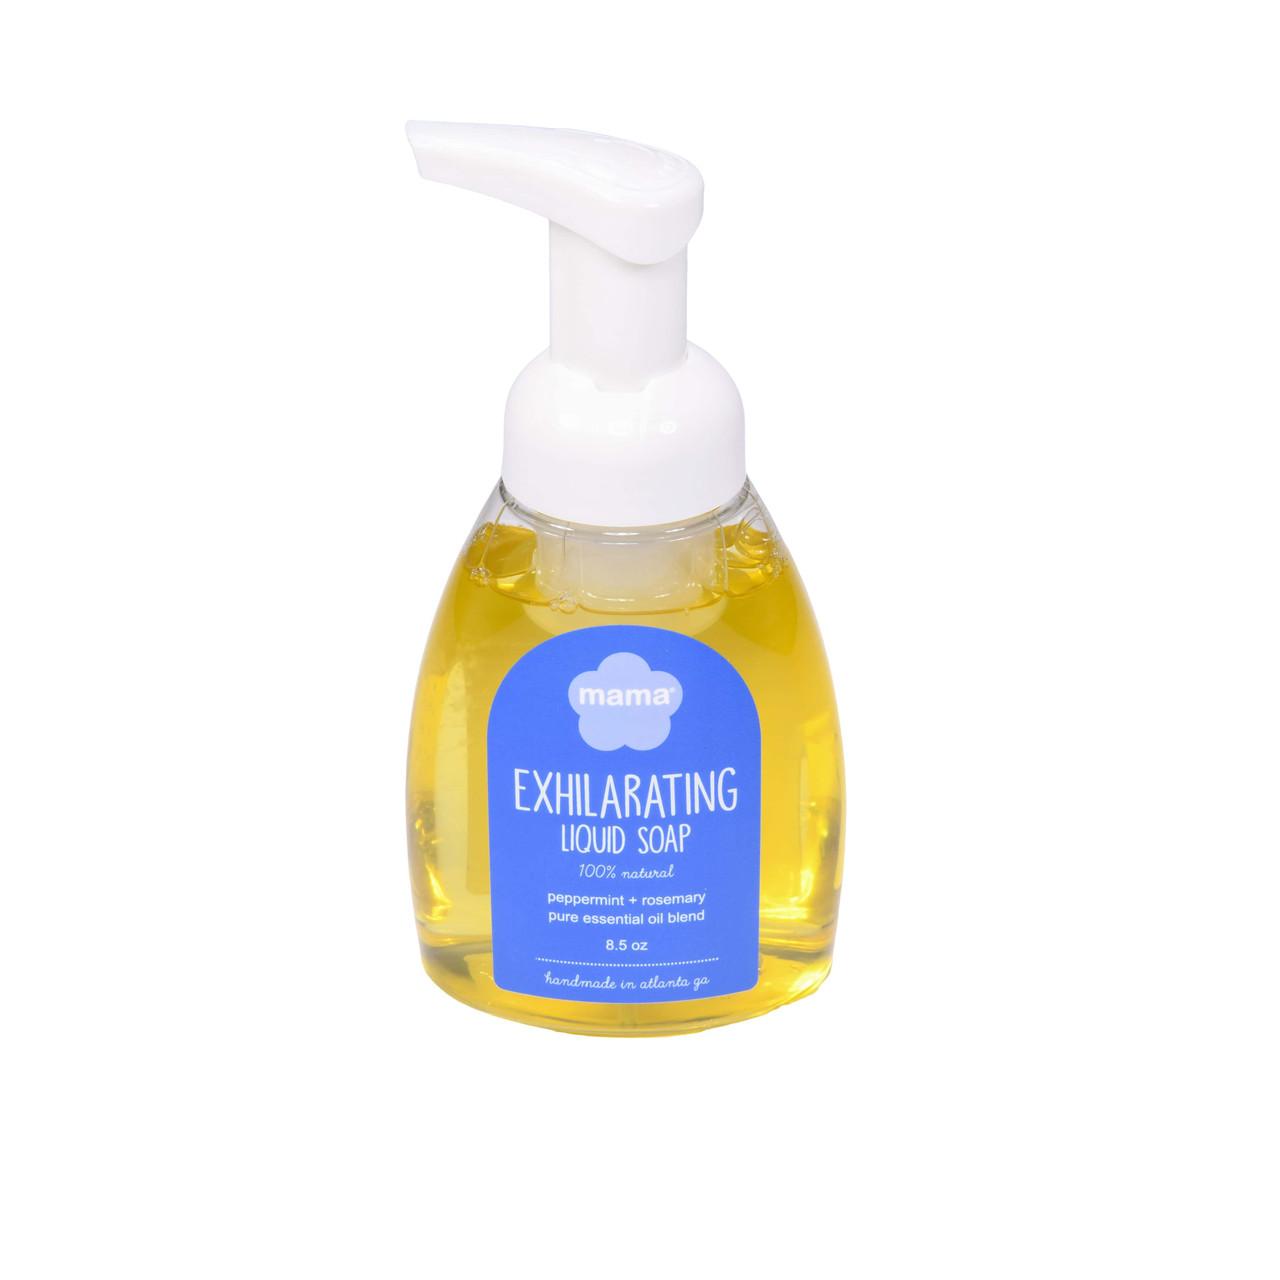 Exhilarating (Peppermint + Rosemary) Liquid Soap | Mama Bath + Body